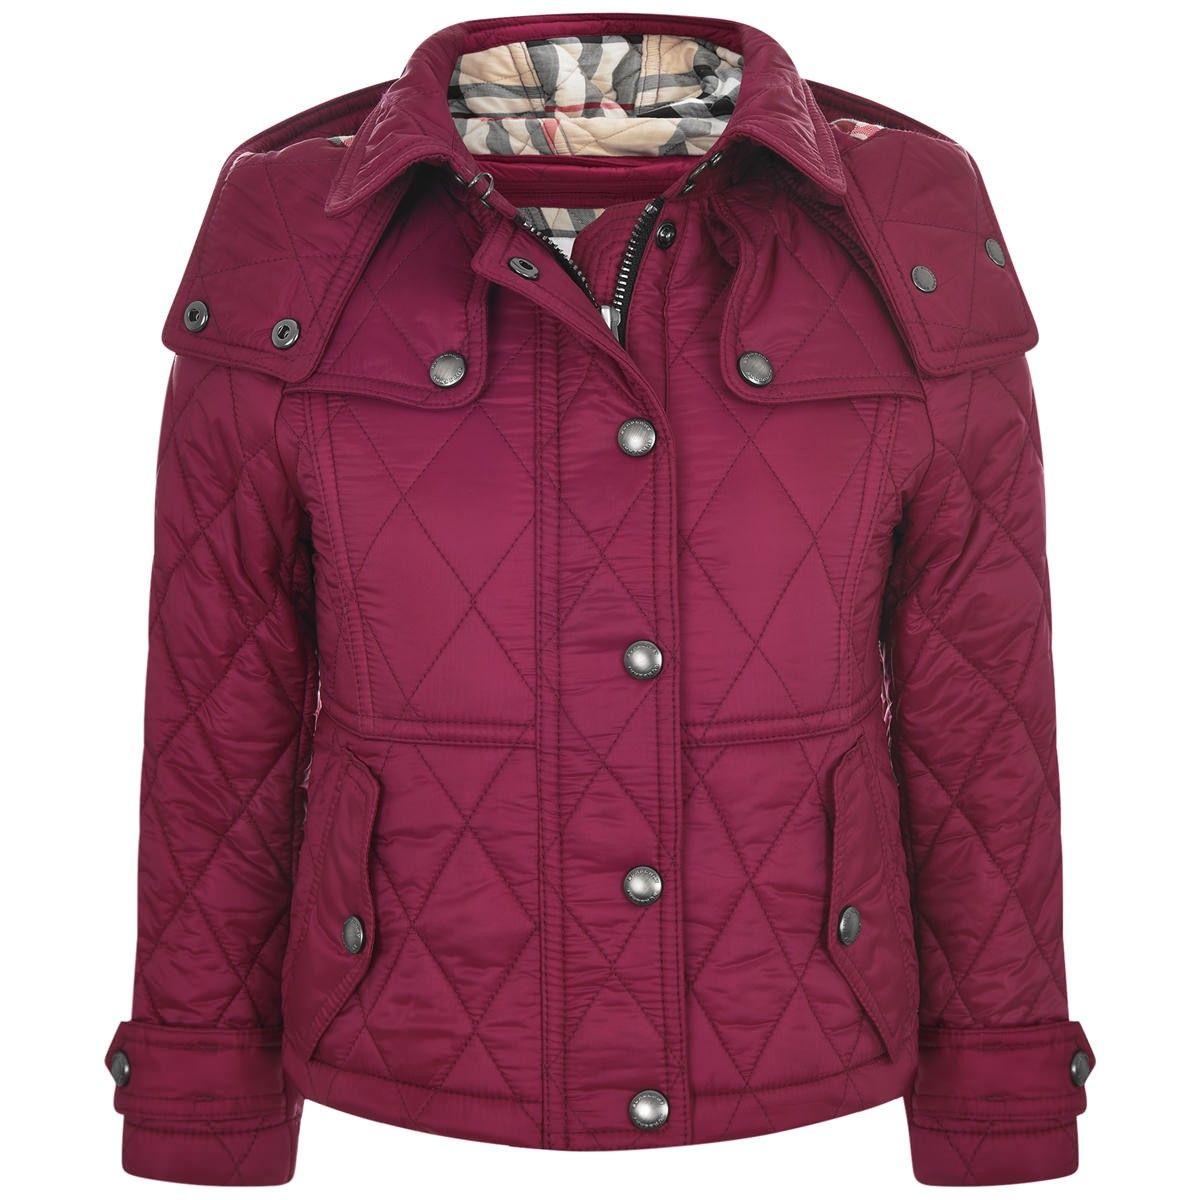 Burberry Girls Burgundy Quilted Jacket Burberry Ss16 Pinterest